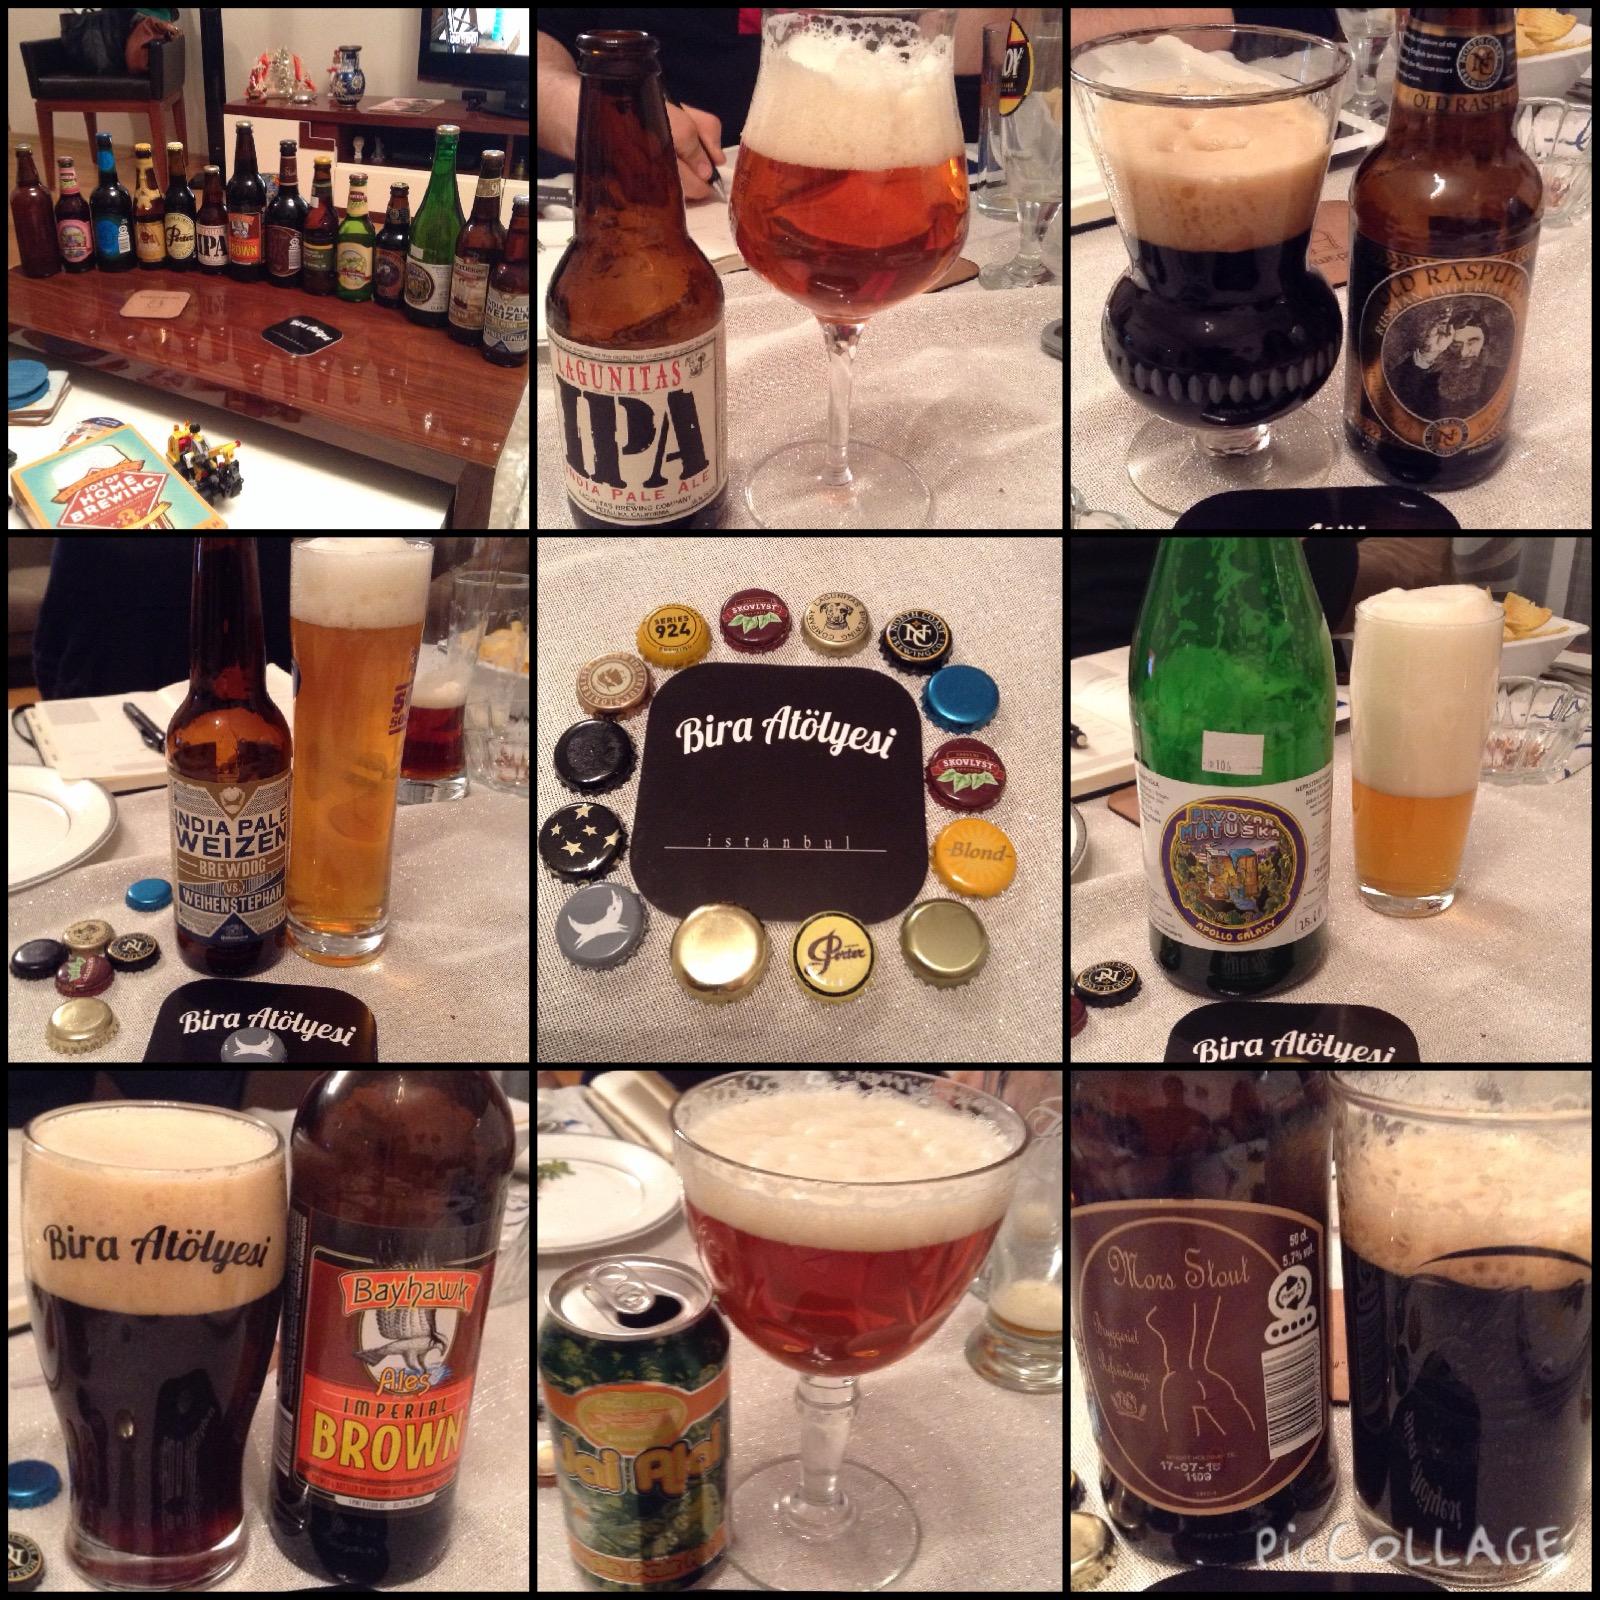 Butik Bira Tadım Aksamları - 7